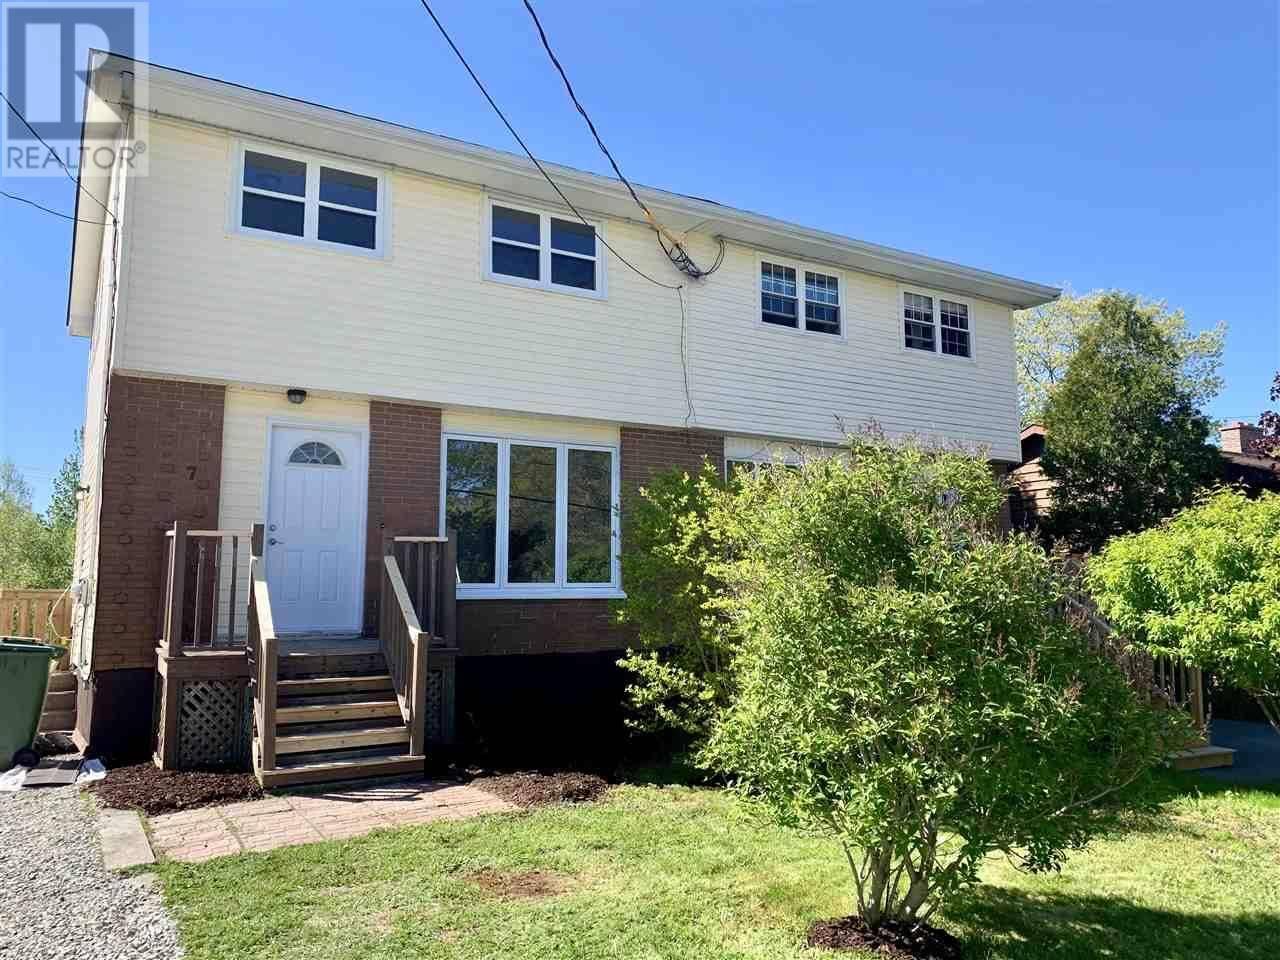 House for sale at 7 Monique Ave Dartmouth Nova Scotia - MLS: 201914401